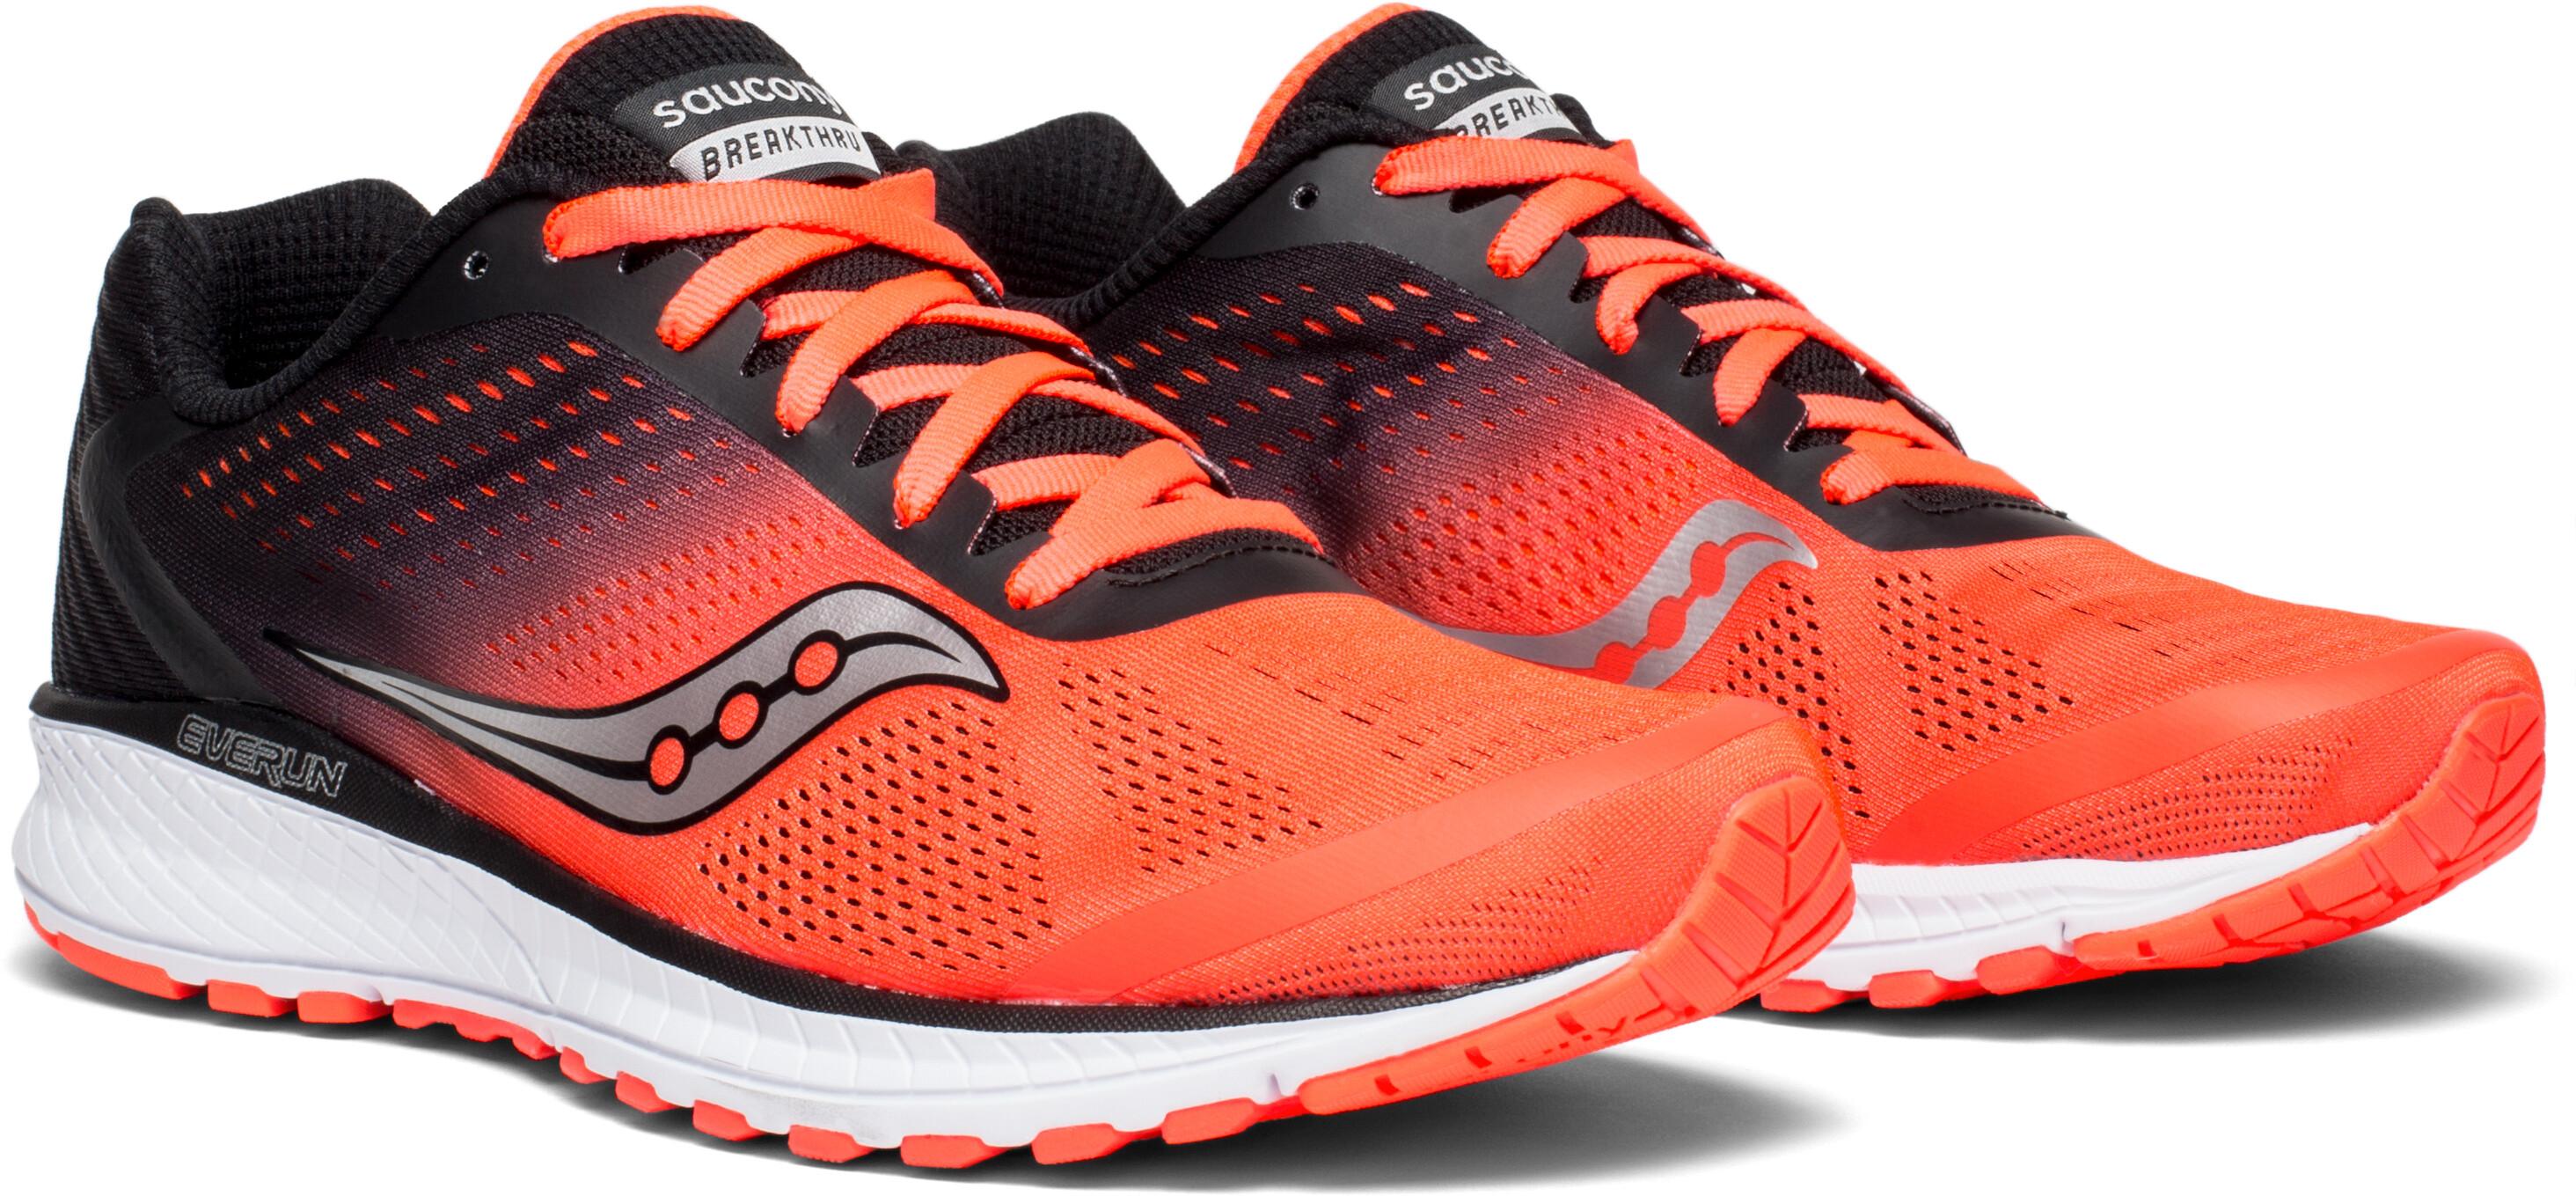 9c1f8e5eaaa saucony Breakthru 4 - Chaussures running Homme - rouge noir ...